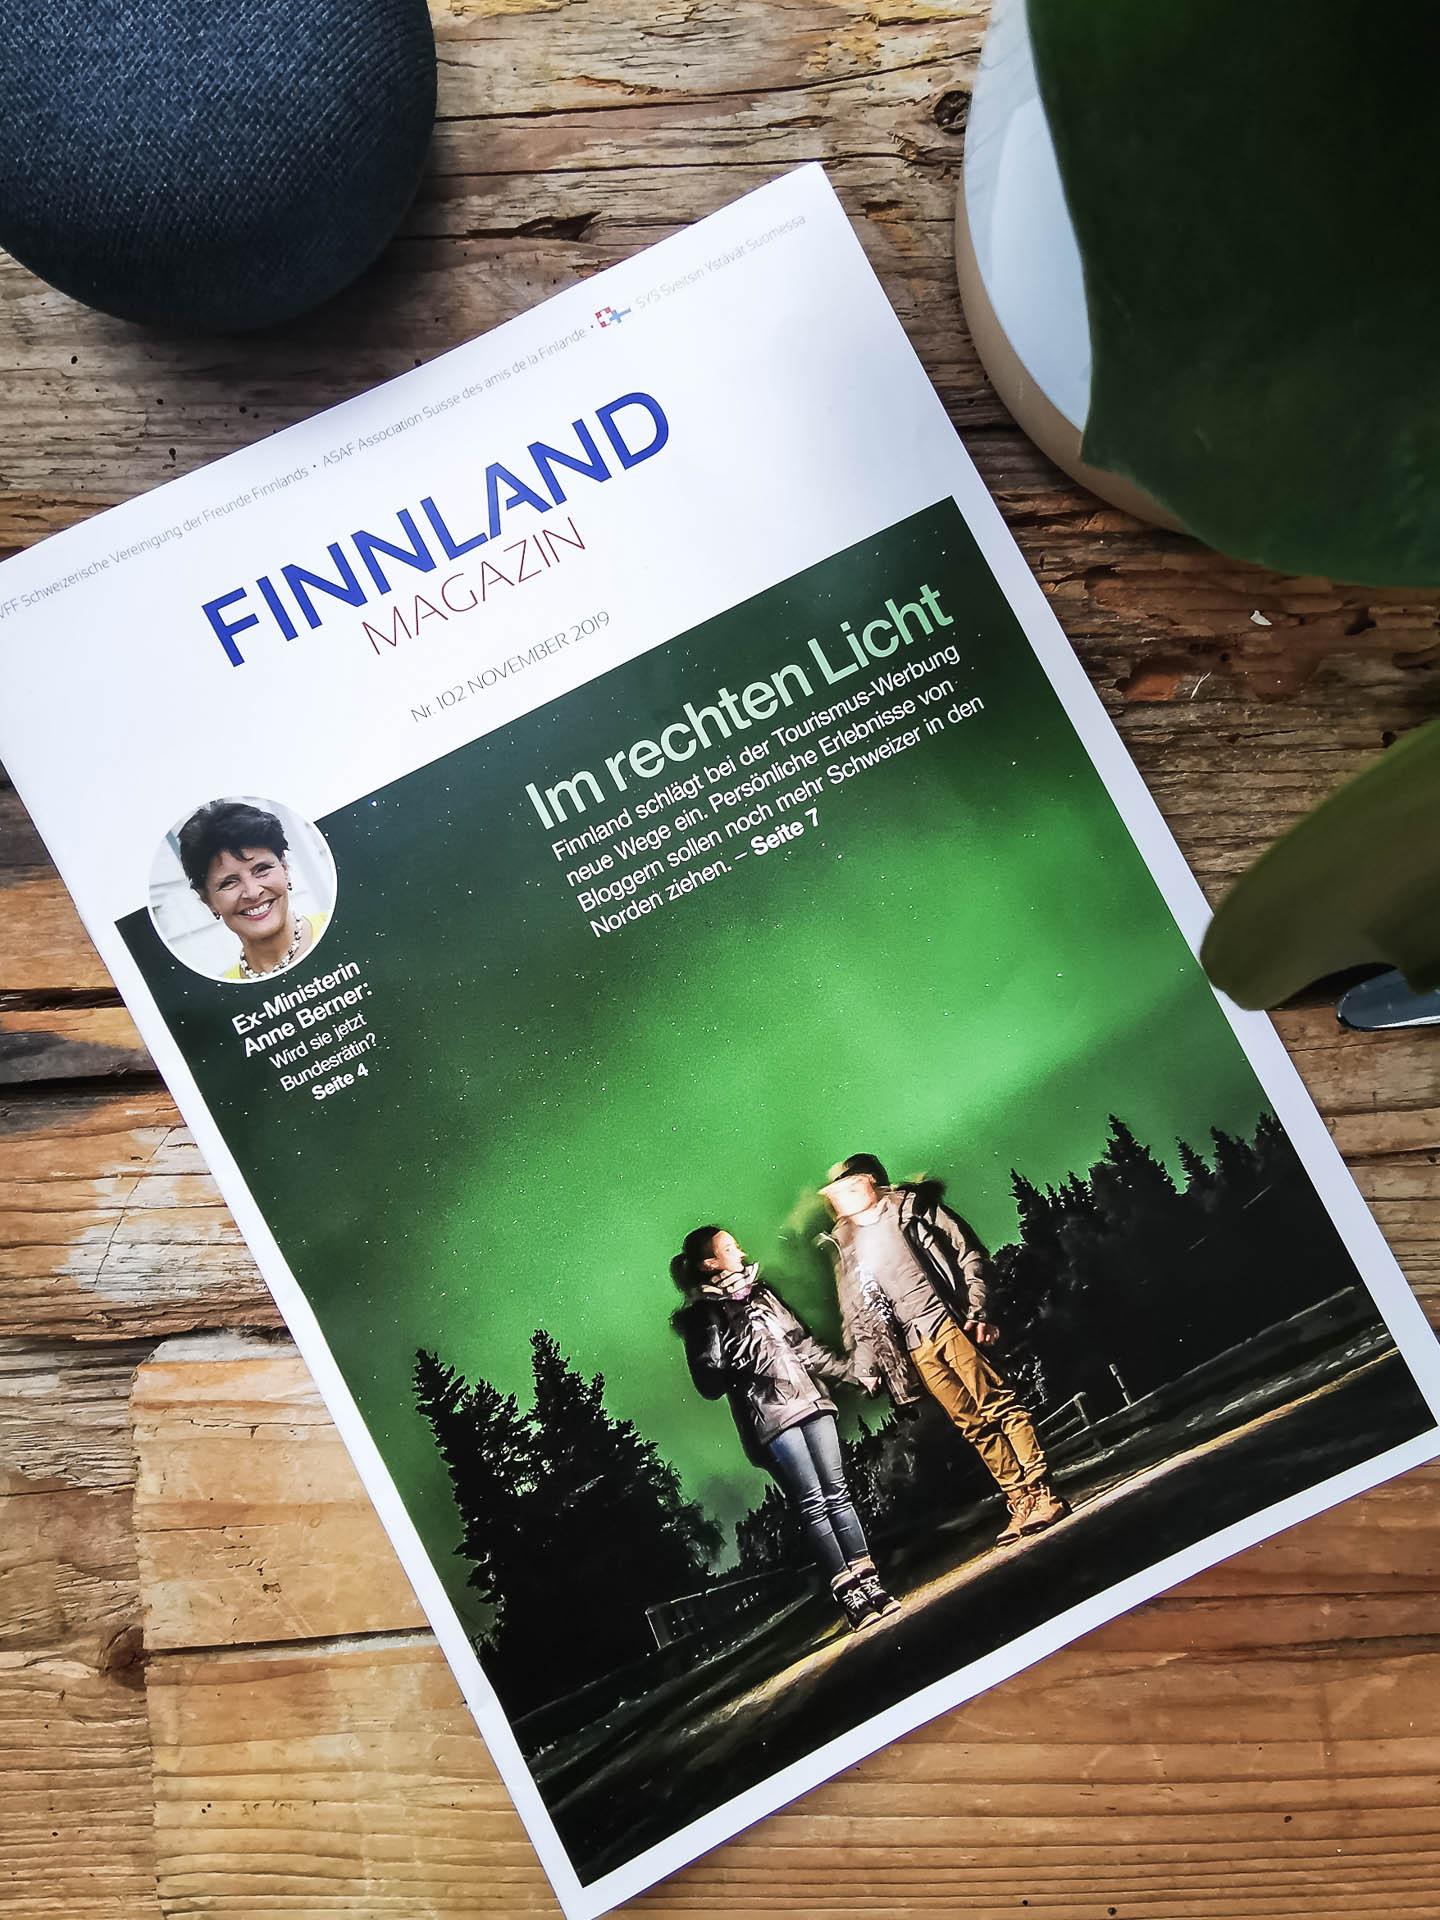 Finnland Magazin LittleCITY Reiseblog